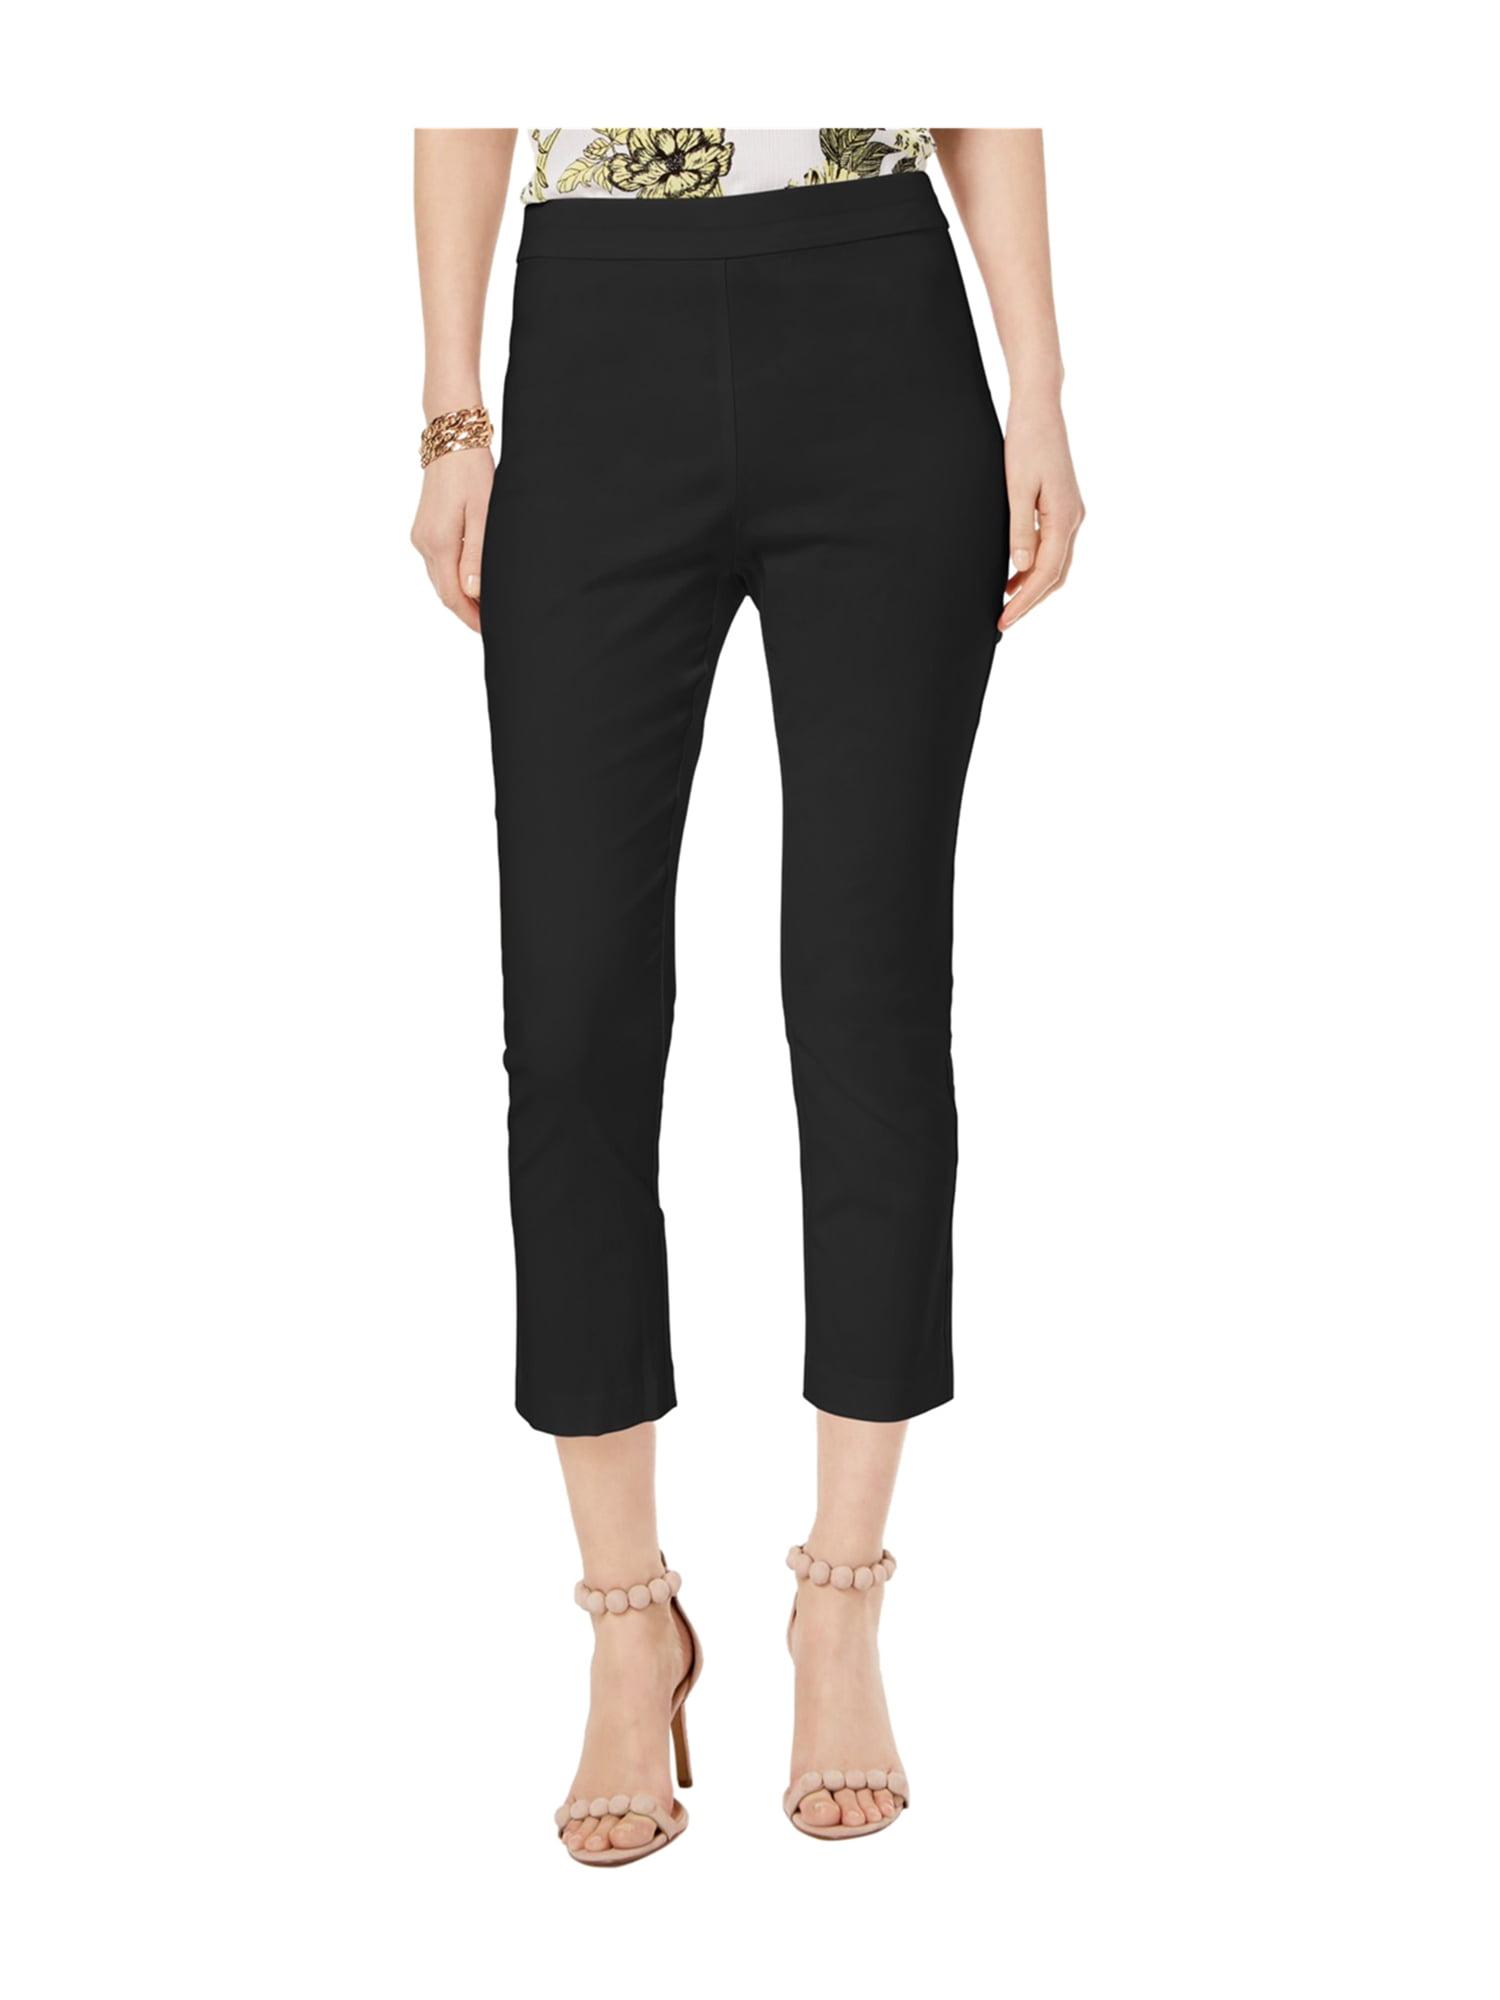 I-N-C Womens Capri Casual Cropped Pants